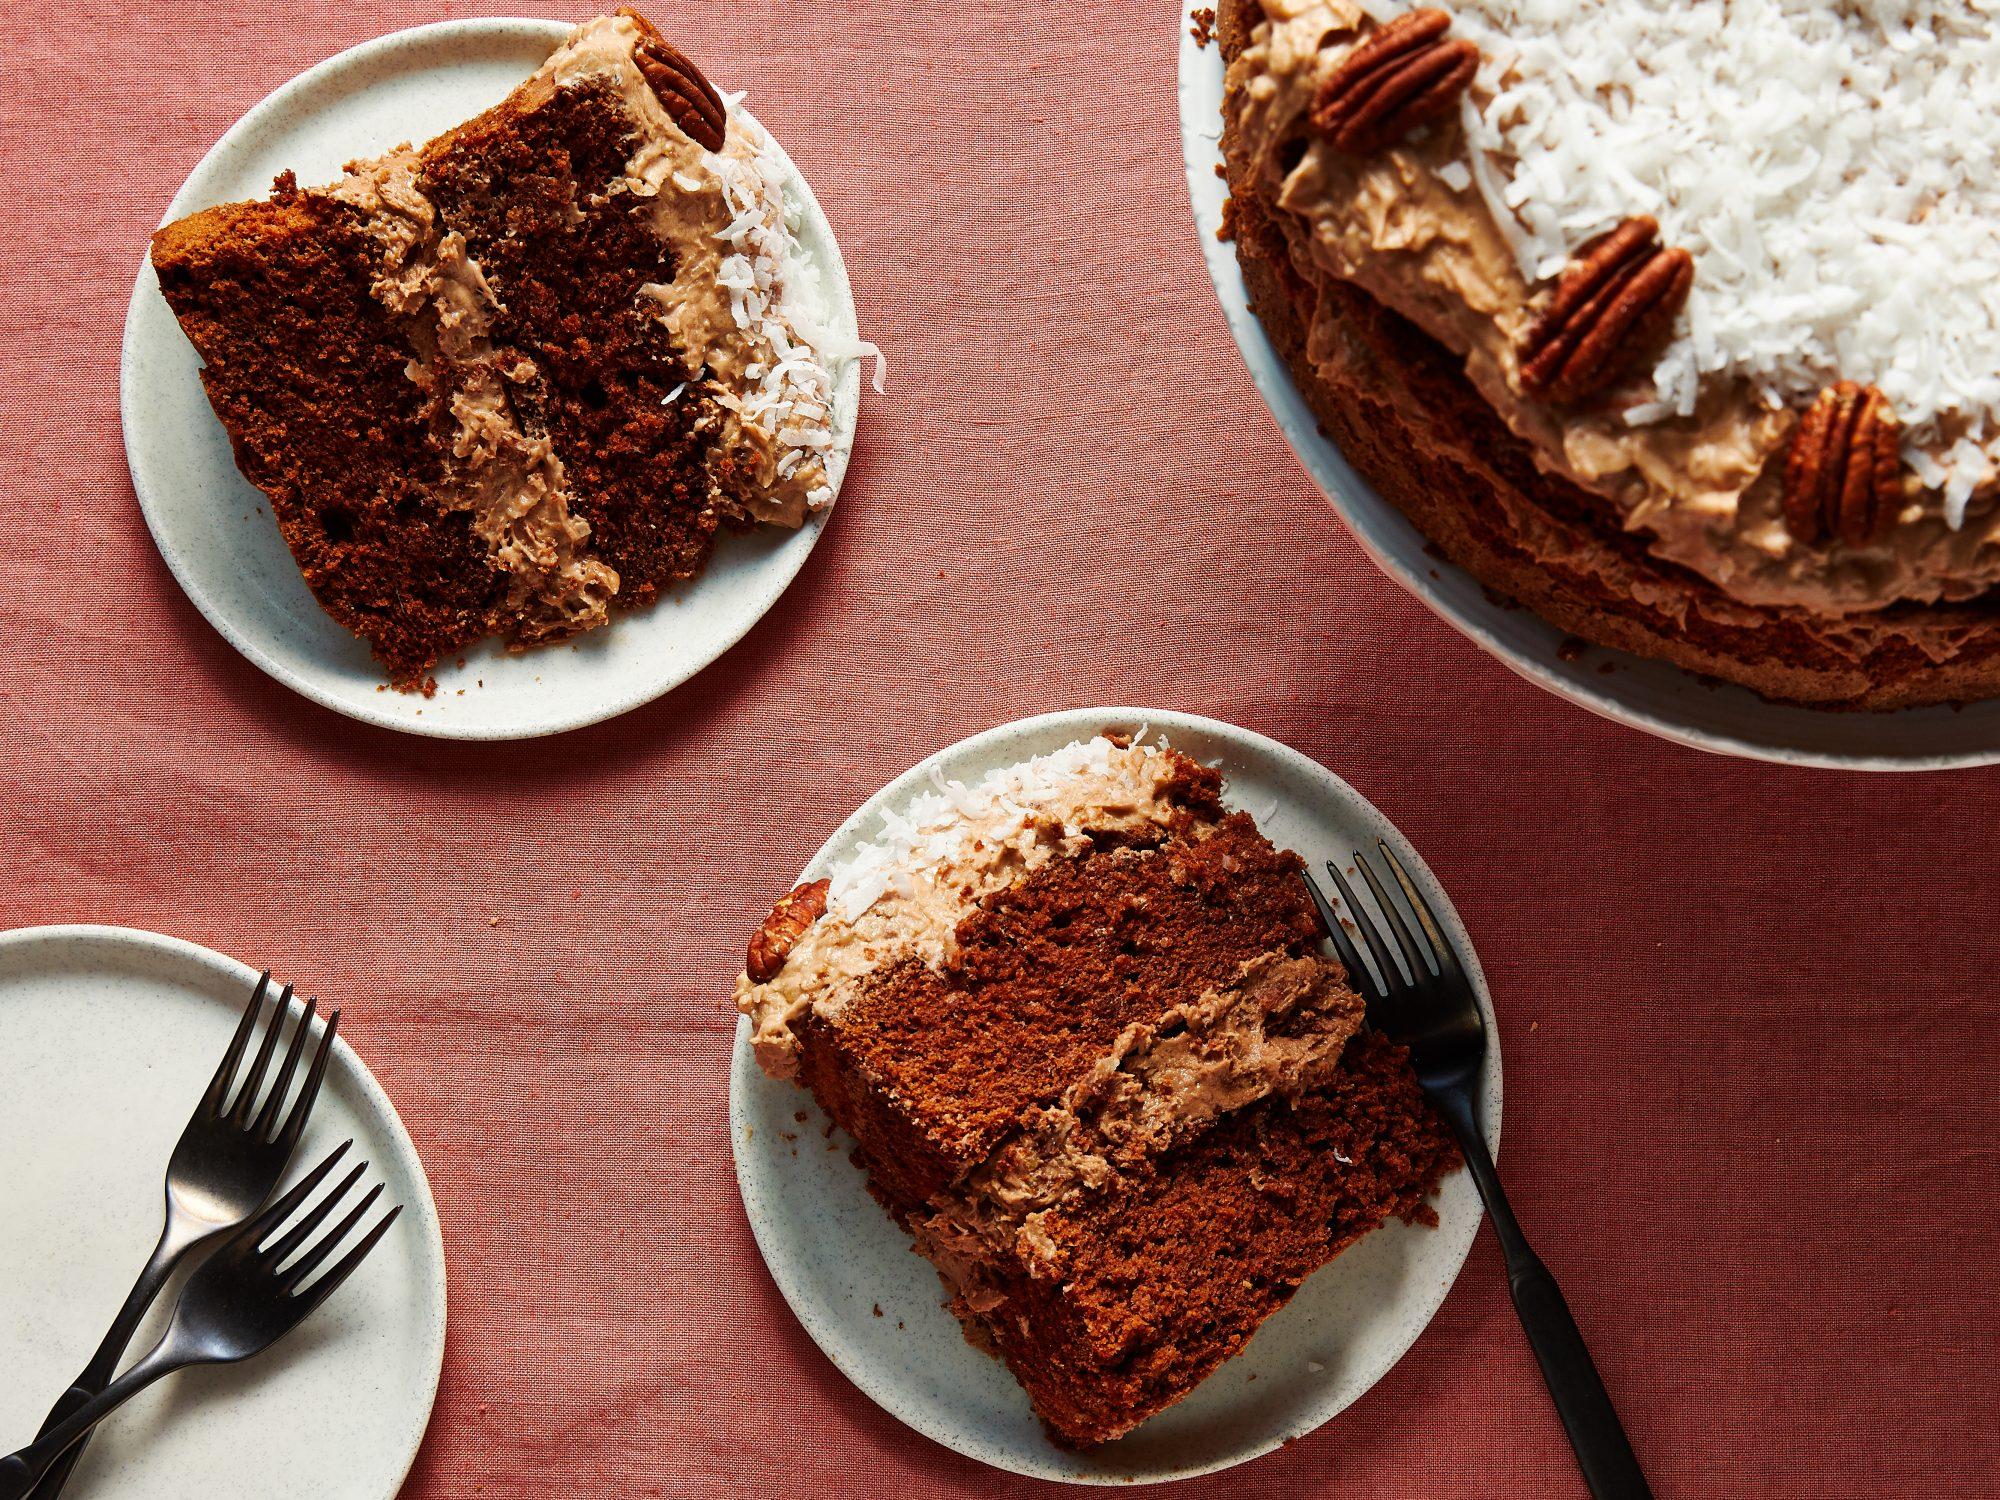 fw-German Chocolate Cake Image Update